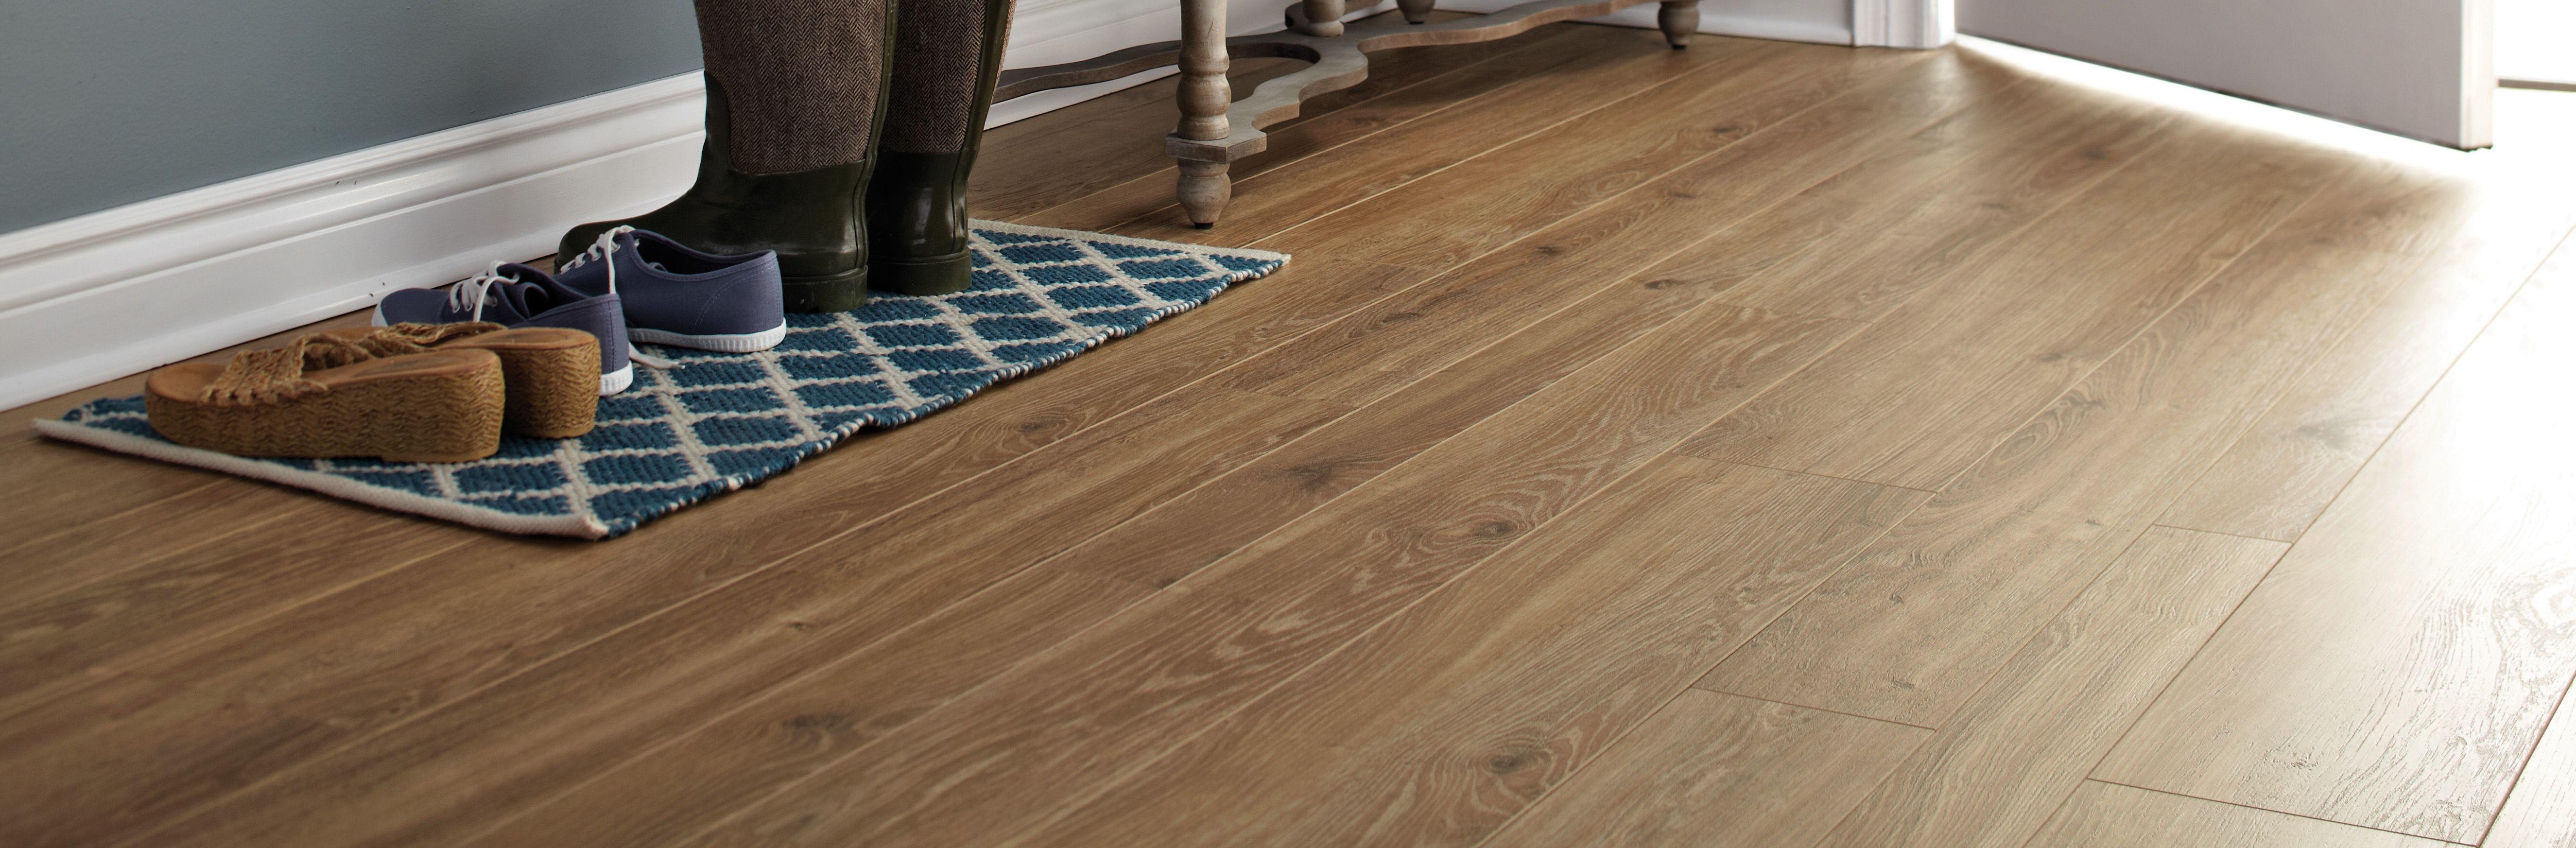 rona hardwood flooring sale of robinsons flooring vinyl plank flooring rona floor with robinsons flooring vinyl plank flooring rona